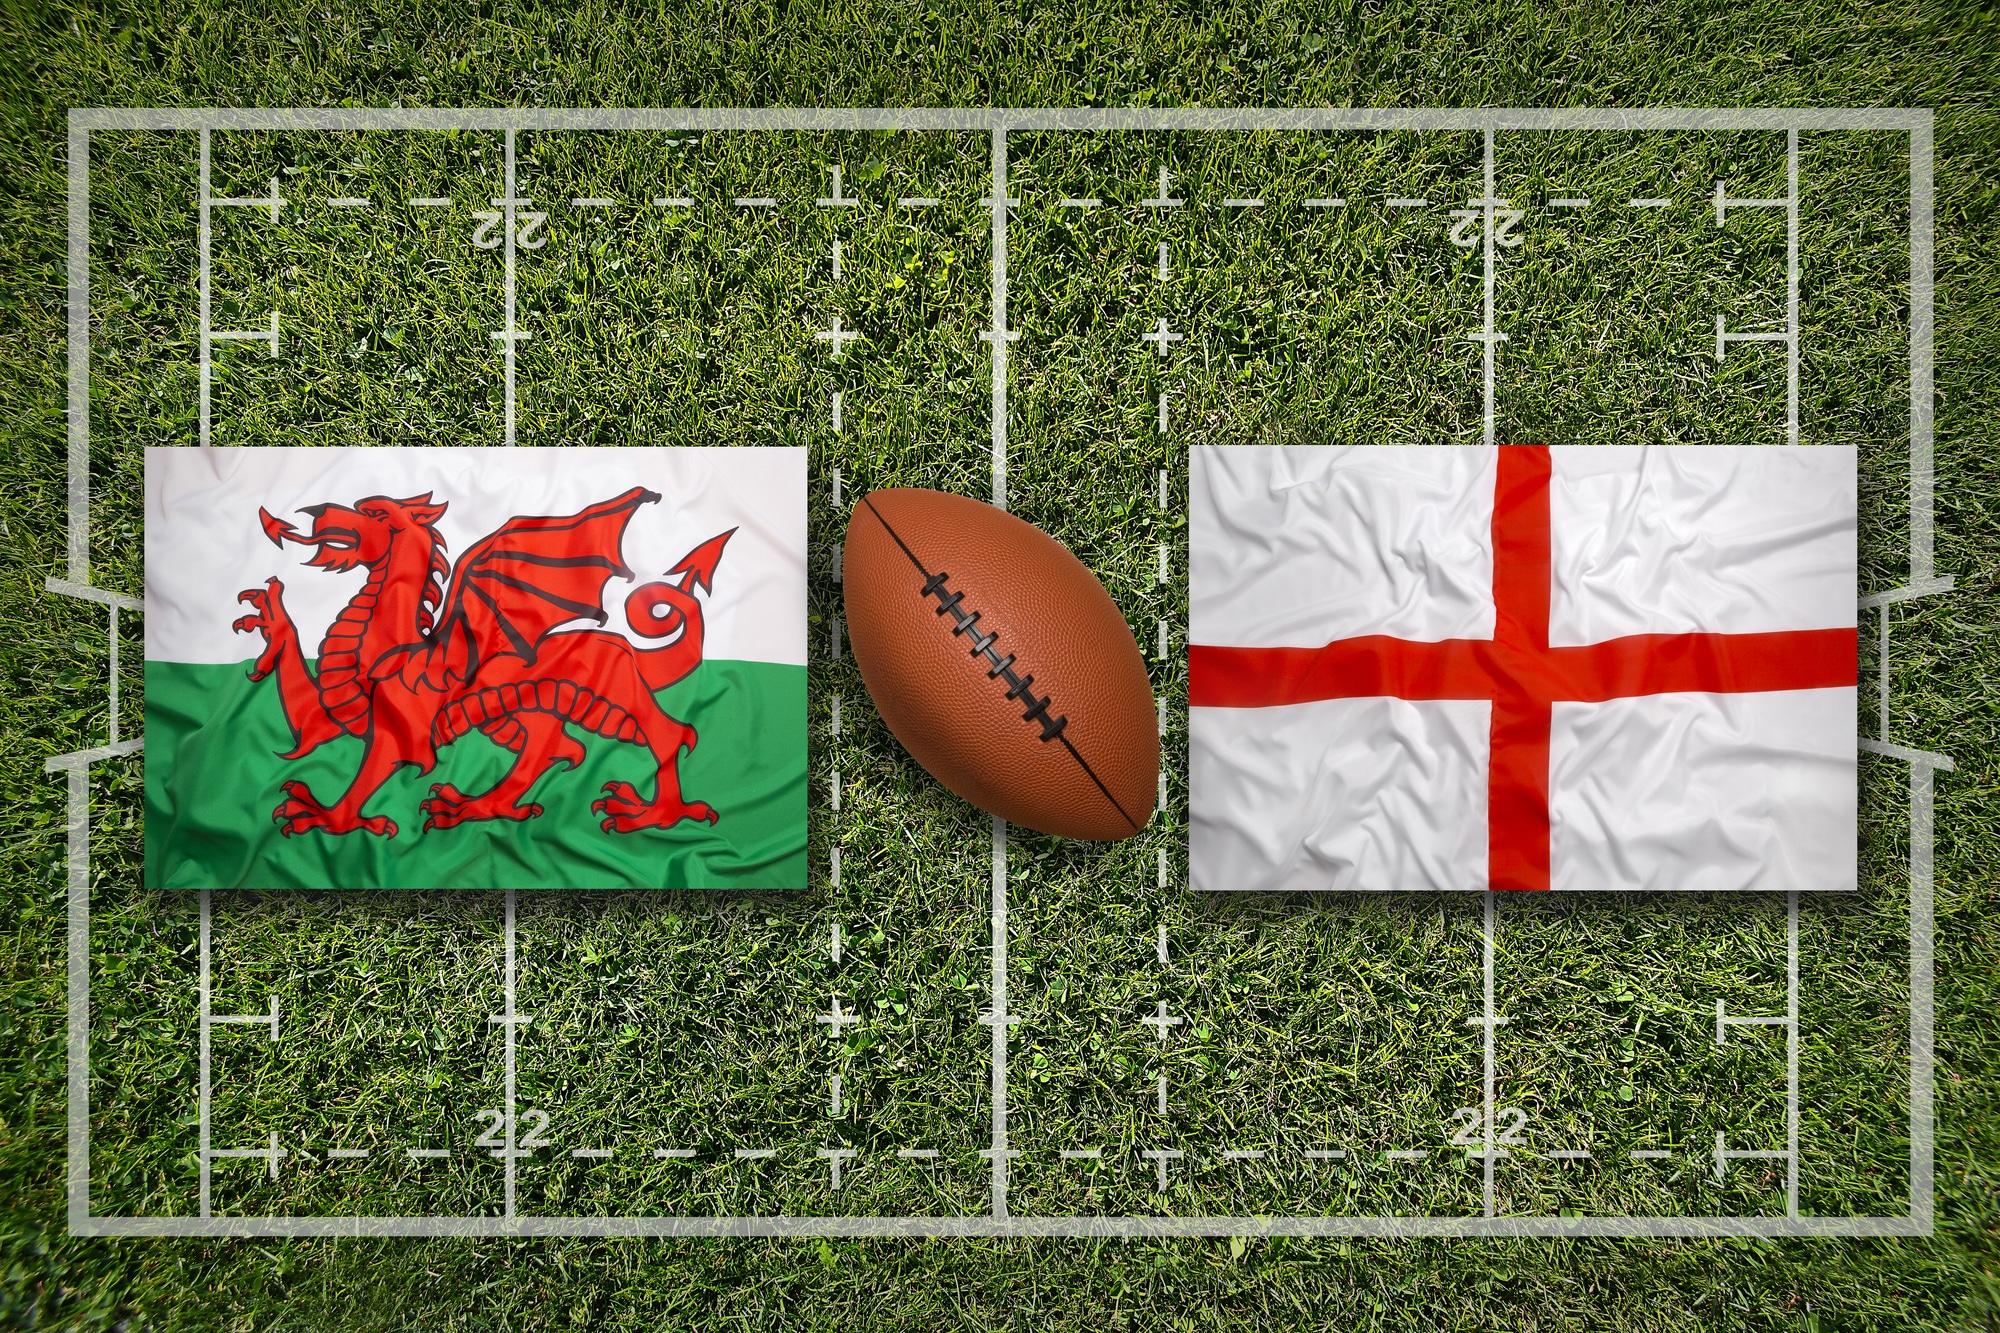 Wales v EnglandRugby Prediction